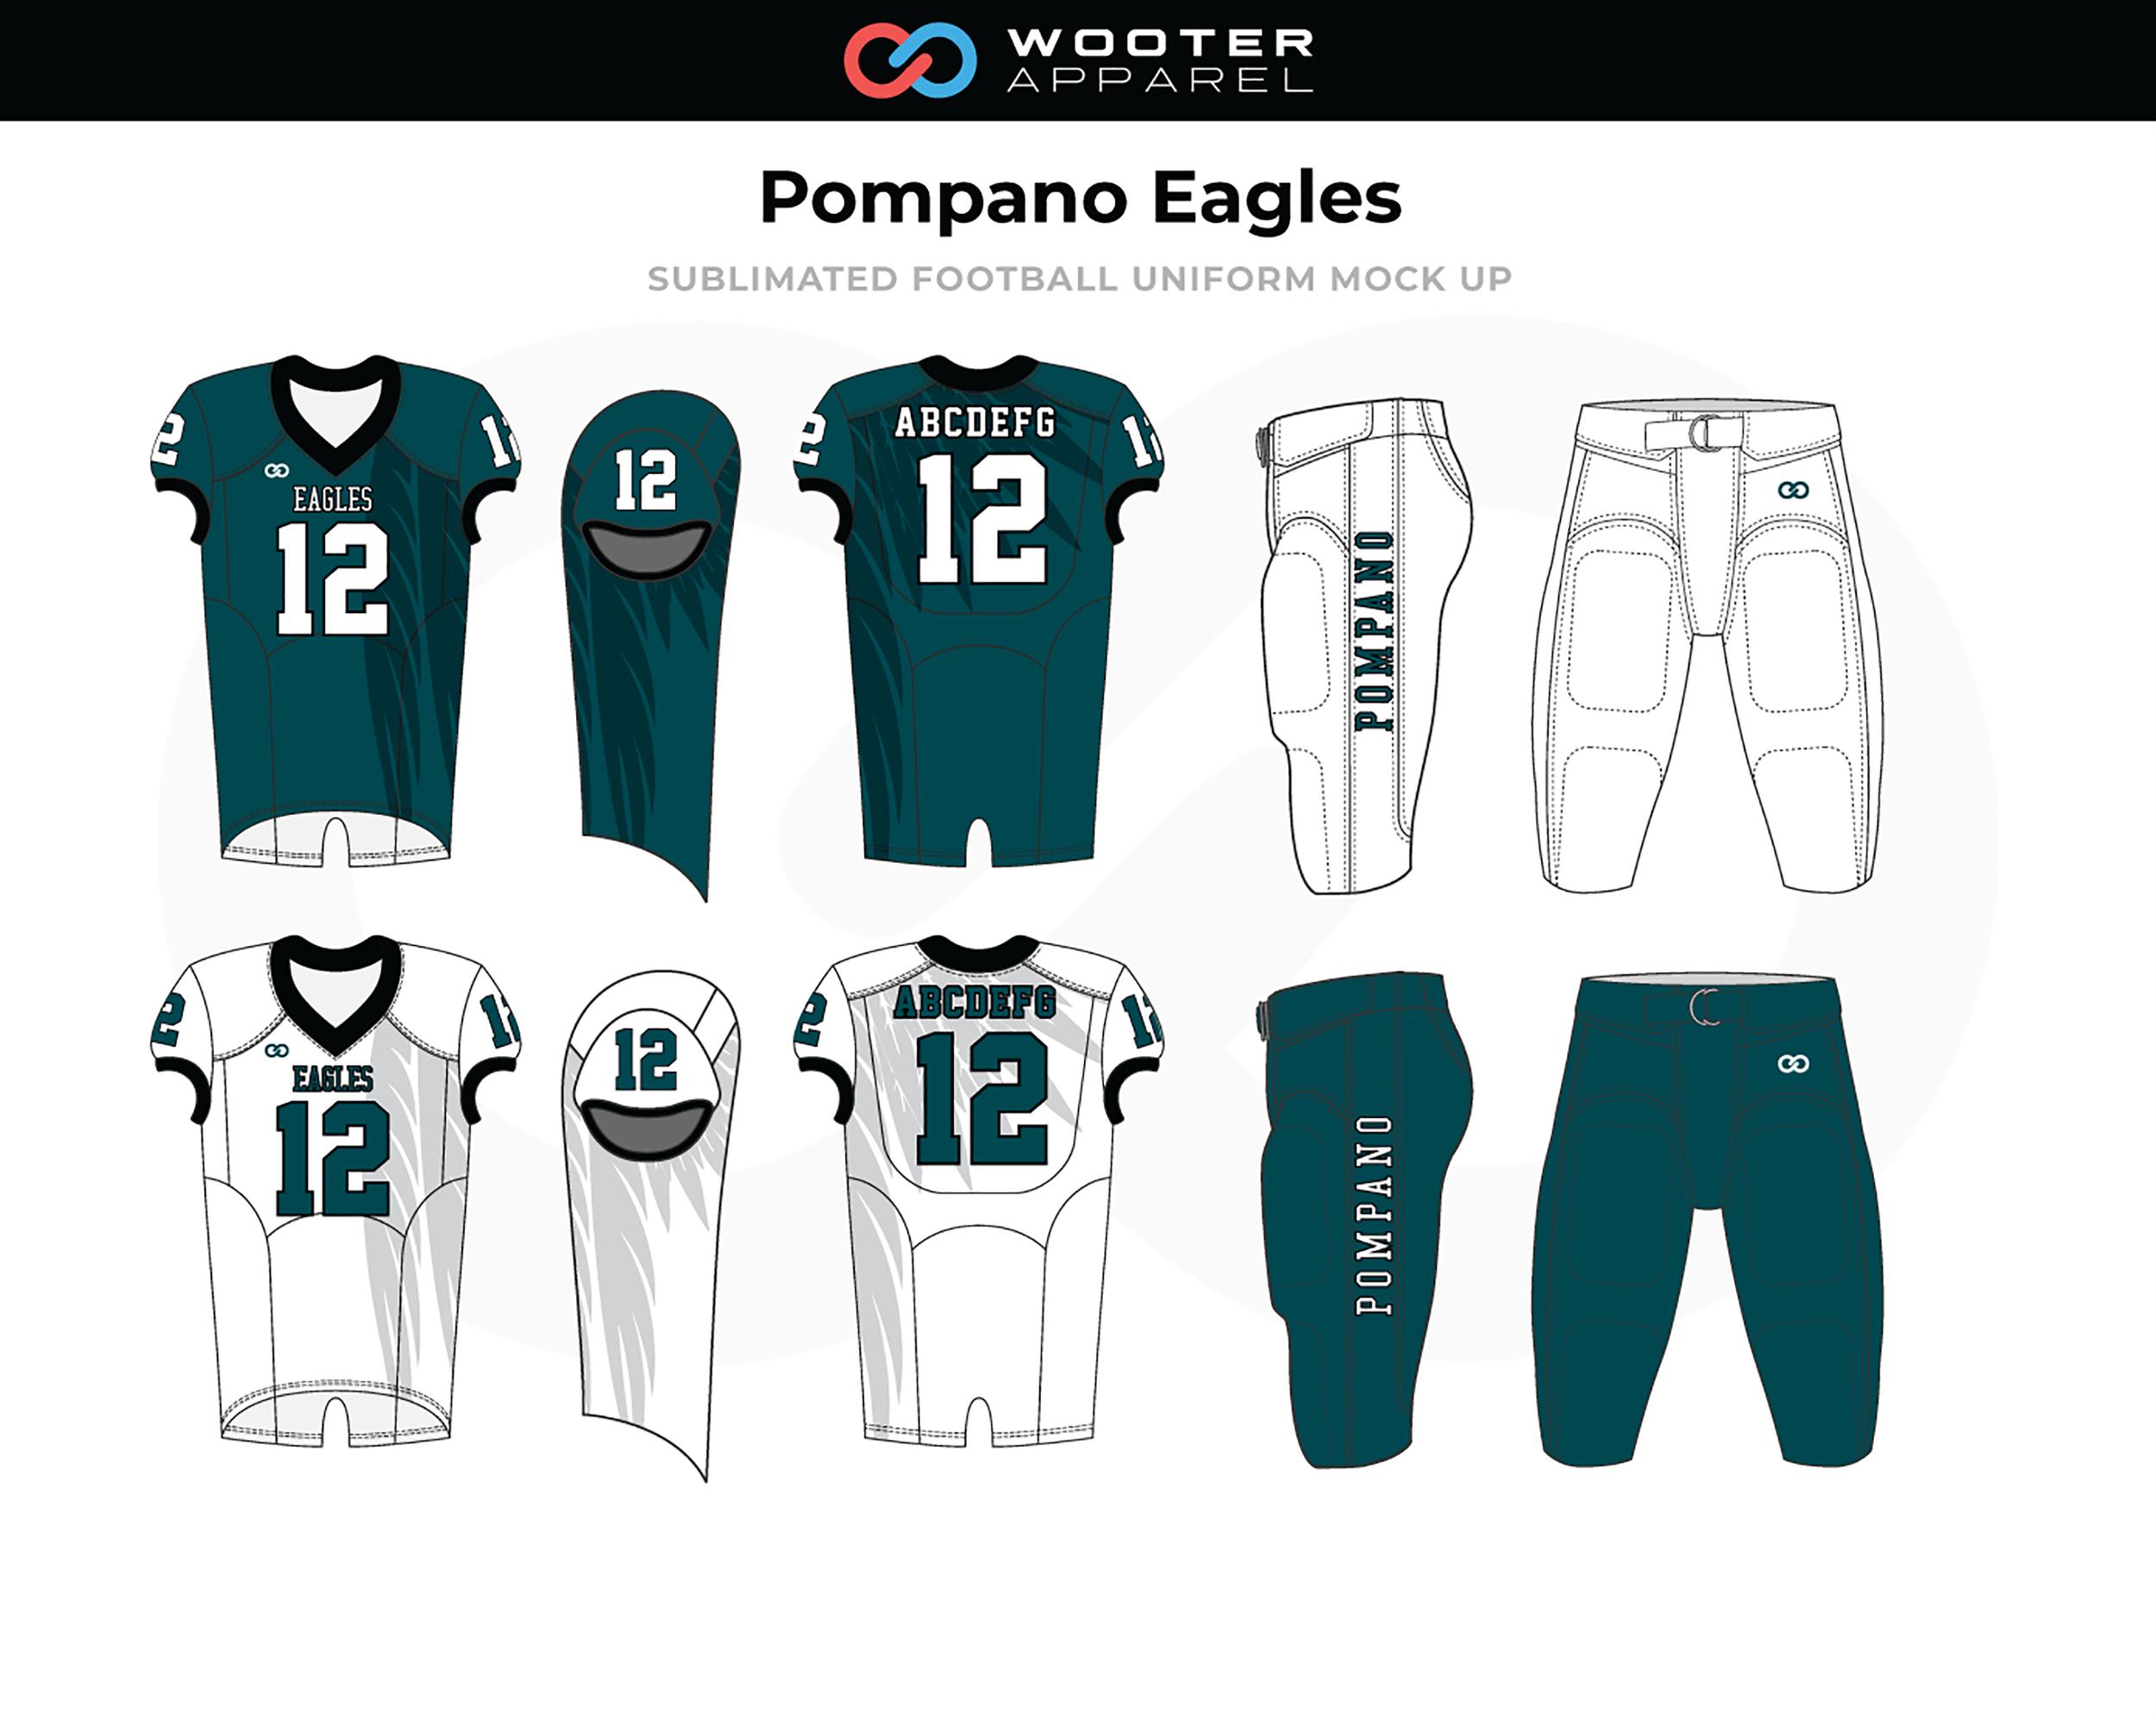 POMPANO EAGLES Blue White Football Uniforms, Jerseys, and Pants